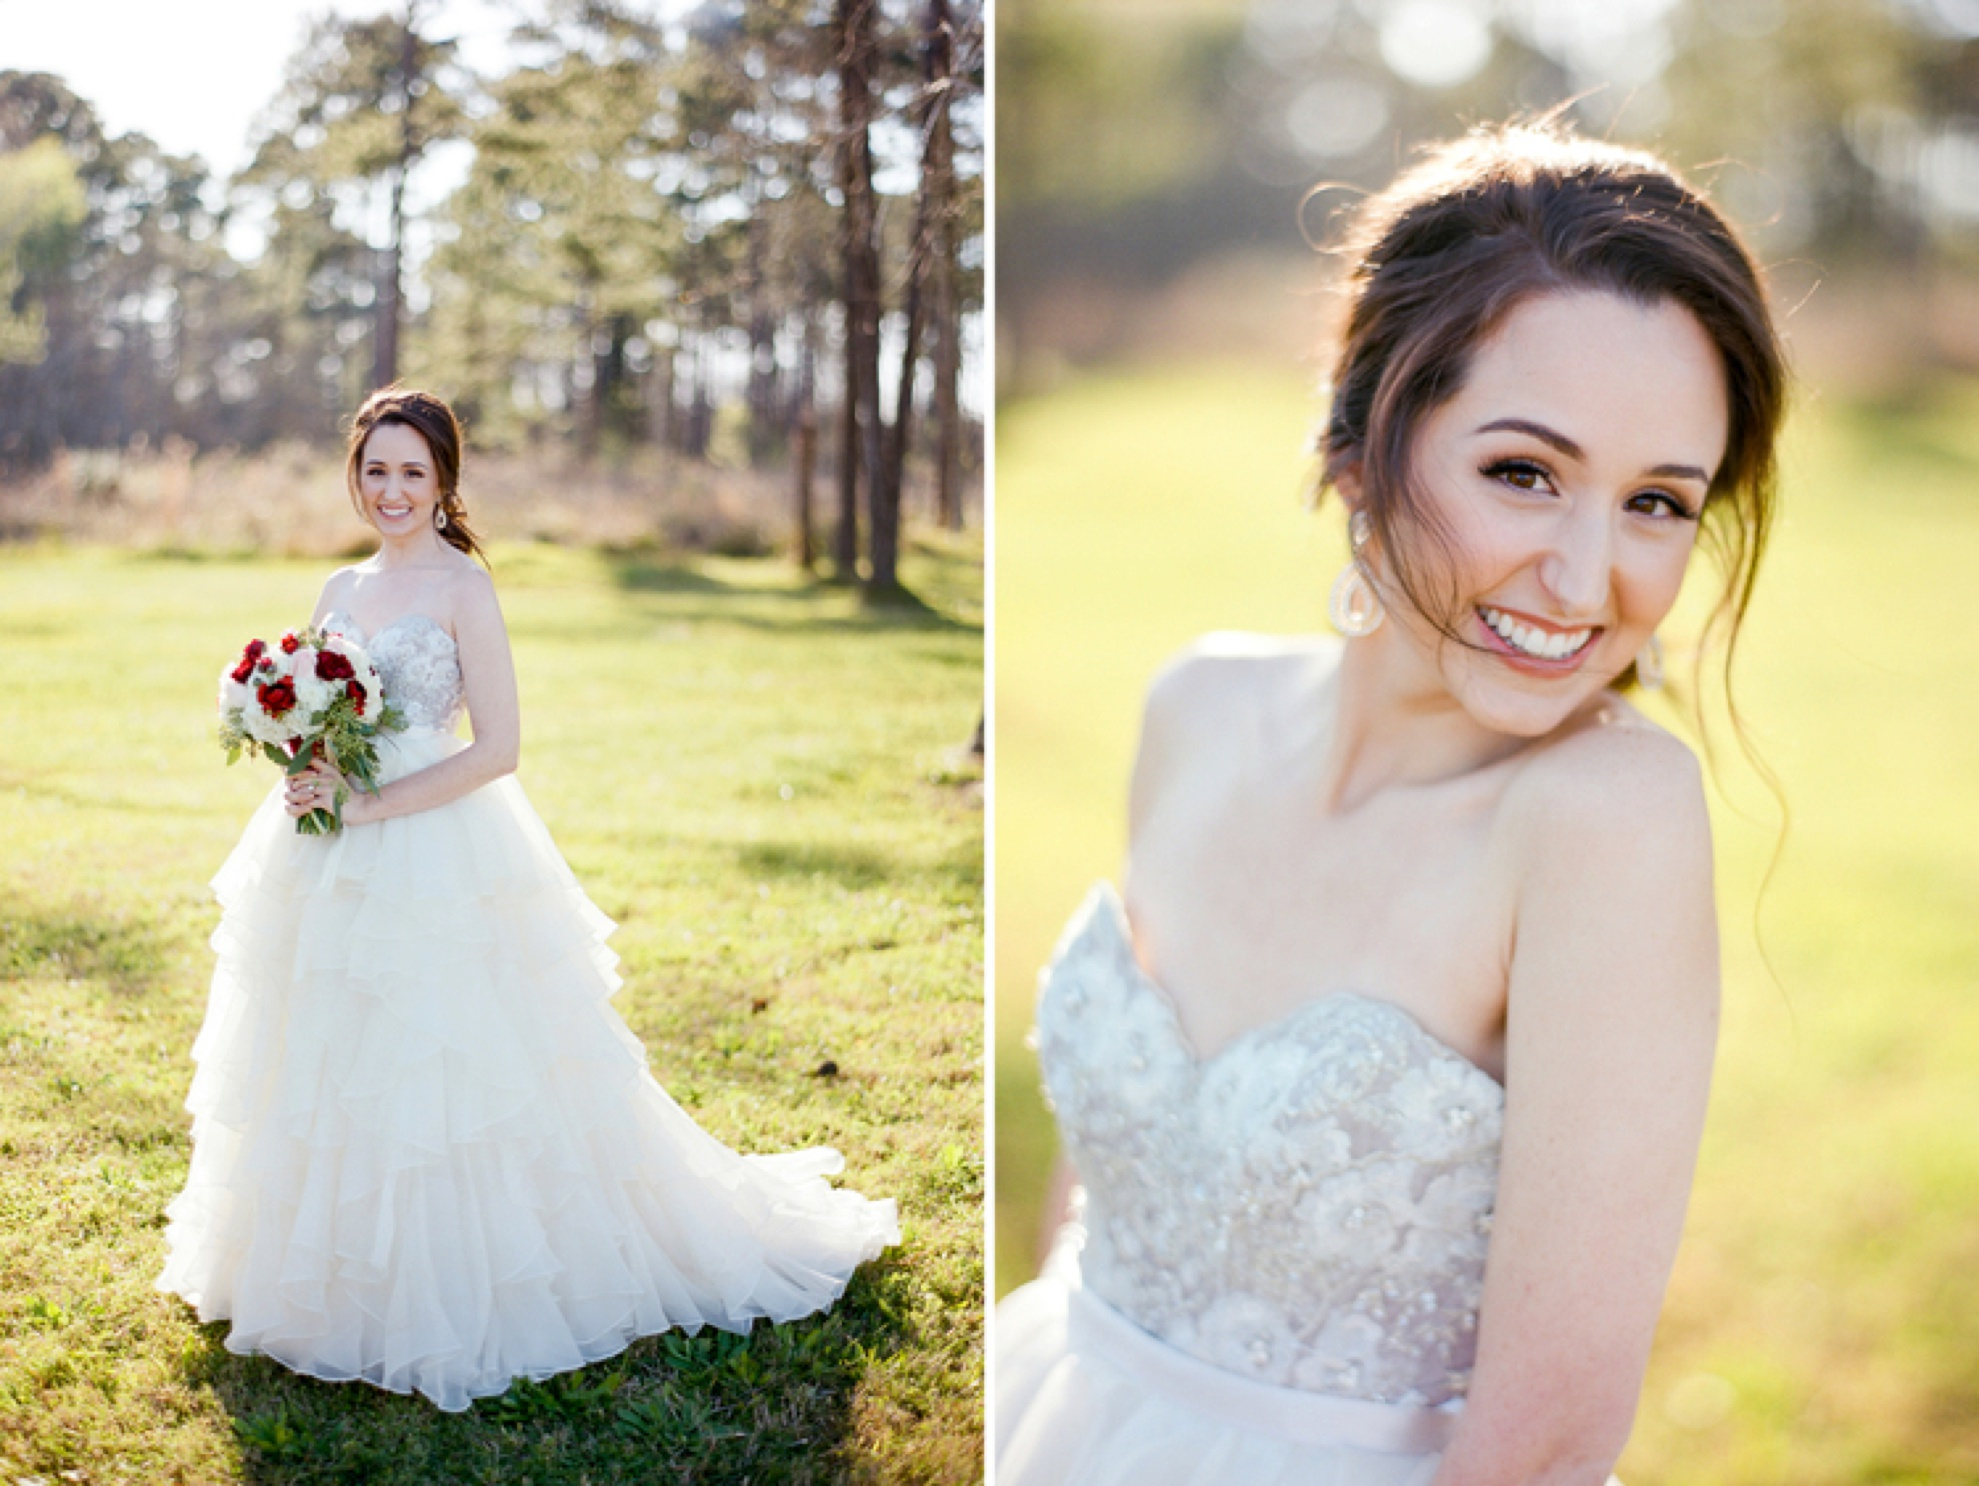 Tuscan-Courtyard-Wedding-Venue-Texas-City-Ceremony-Reception-Photographer-Dana-Fernandez-Photography-7.jpg